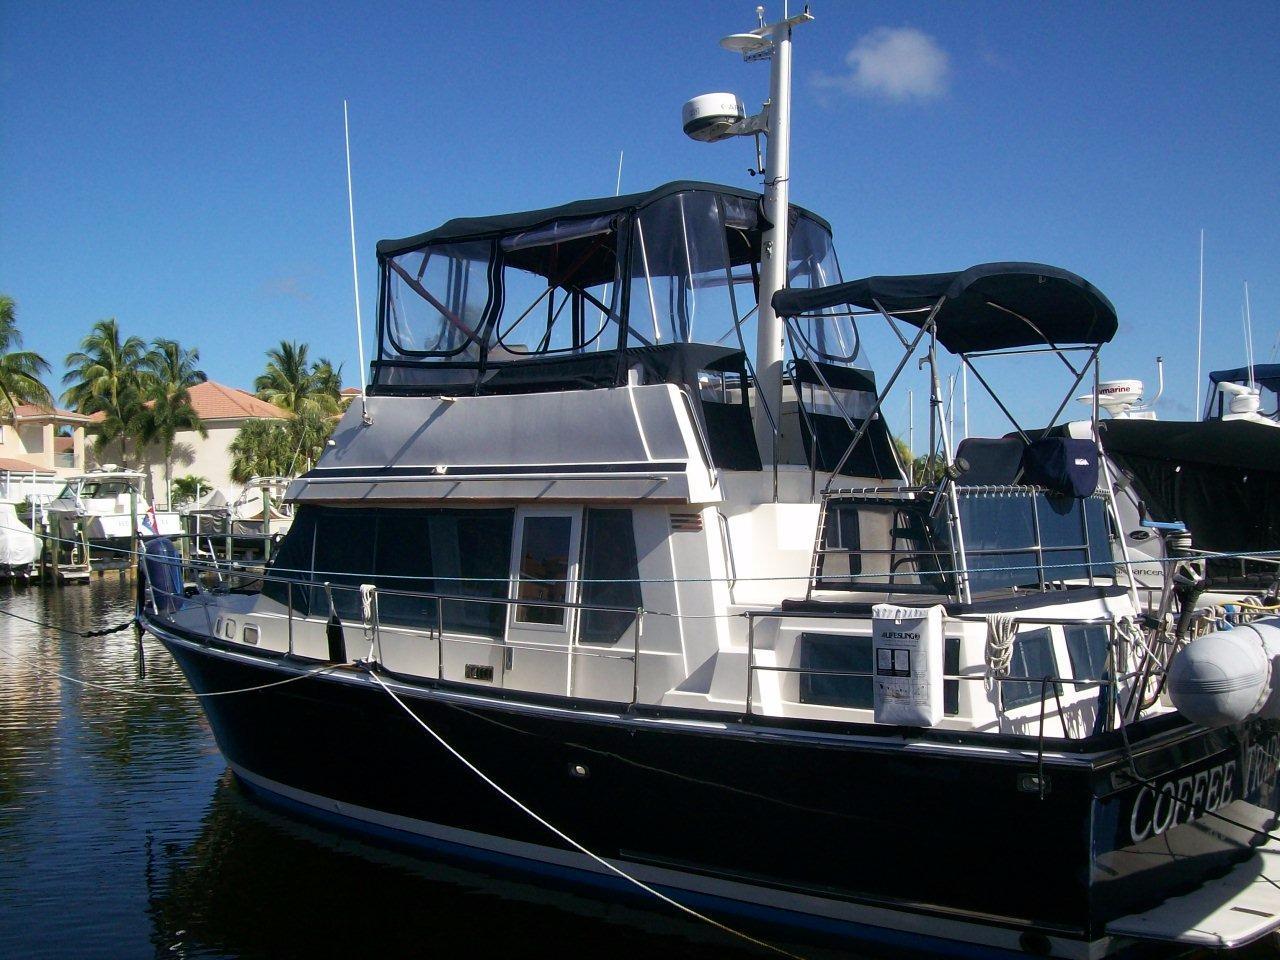 36' Sabreline 1995 Fast Trawler